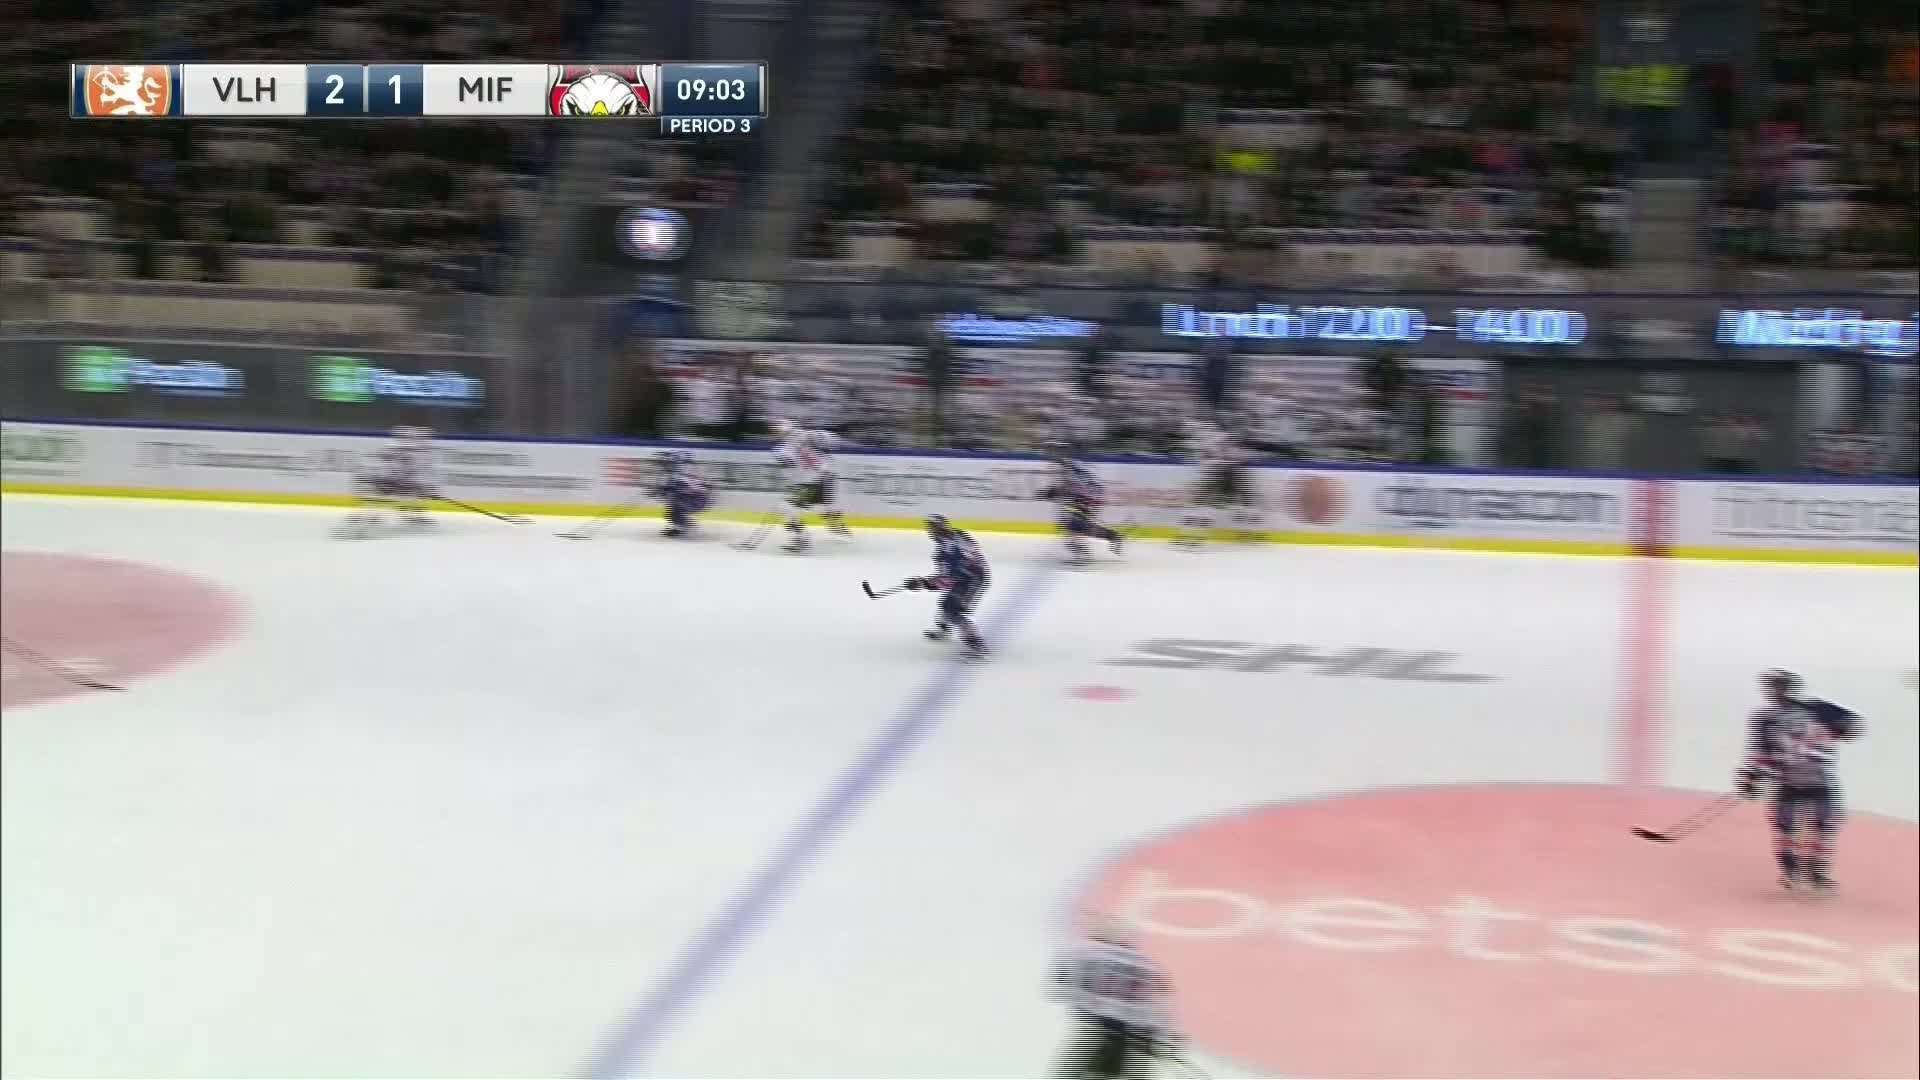 Växjö Lakers - Malmö Redhawks 3-1